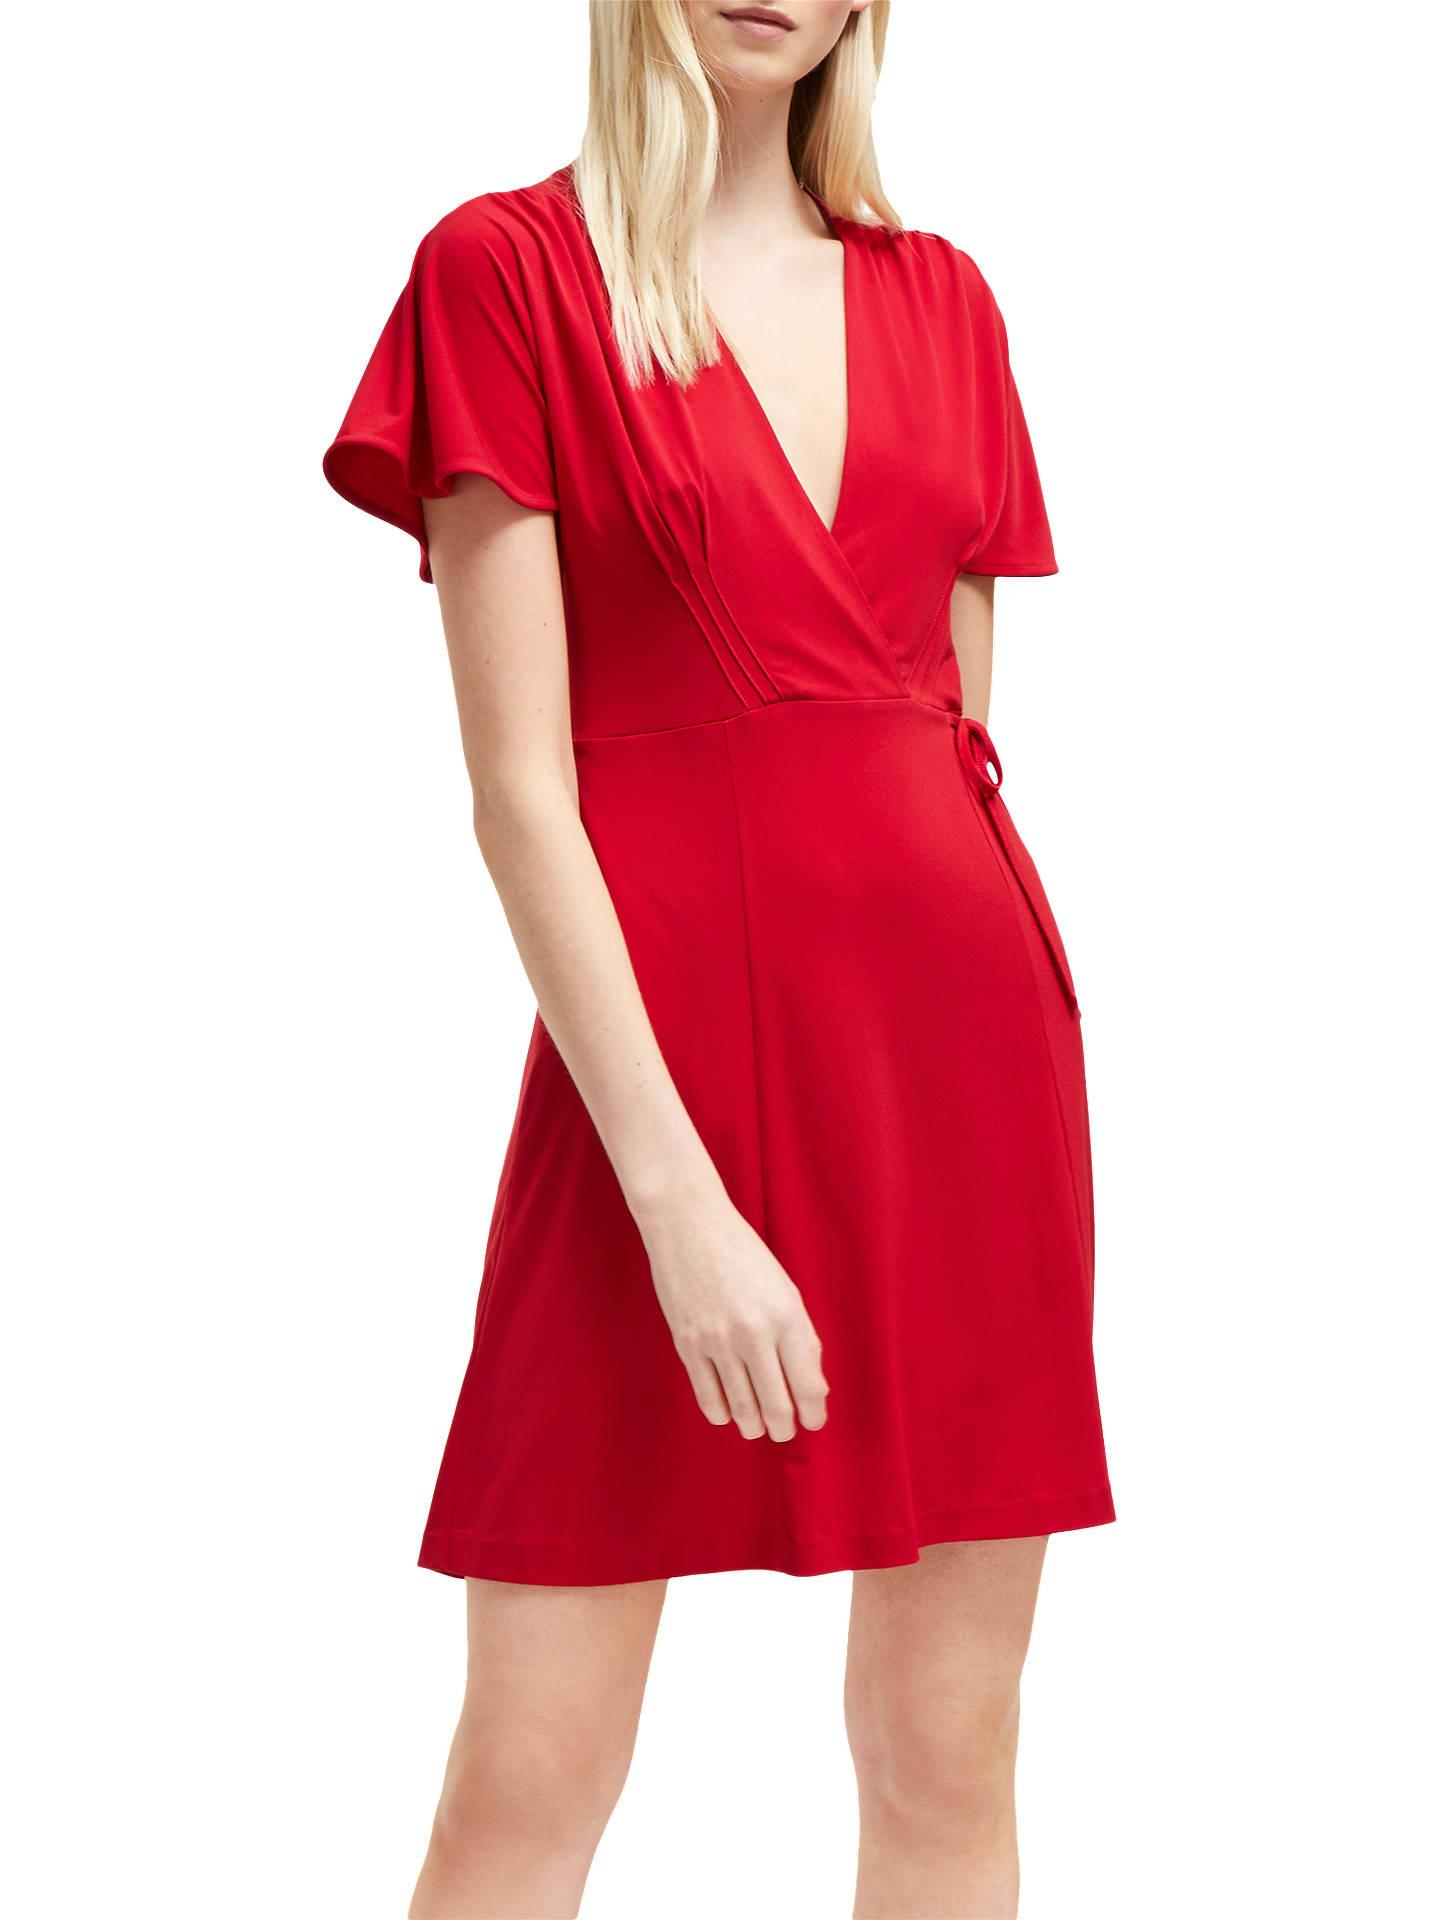 de7c4274b0 Buy French Connection Alexia Crepe Jersey Wrap Dress